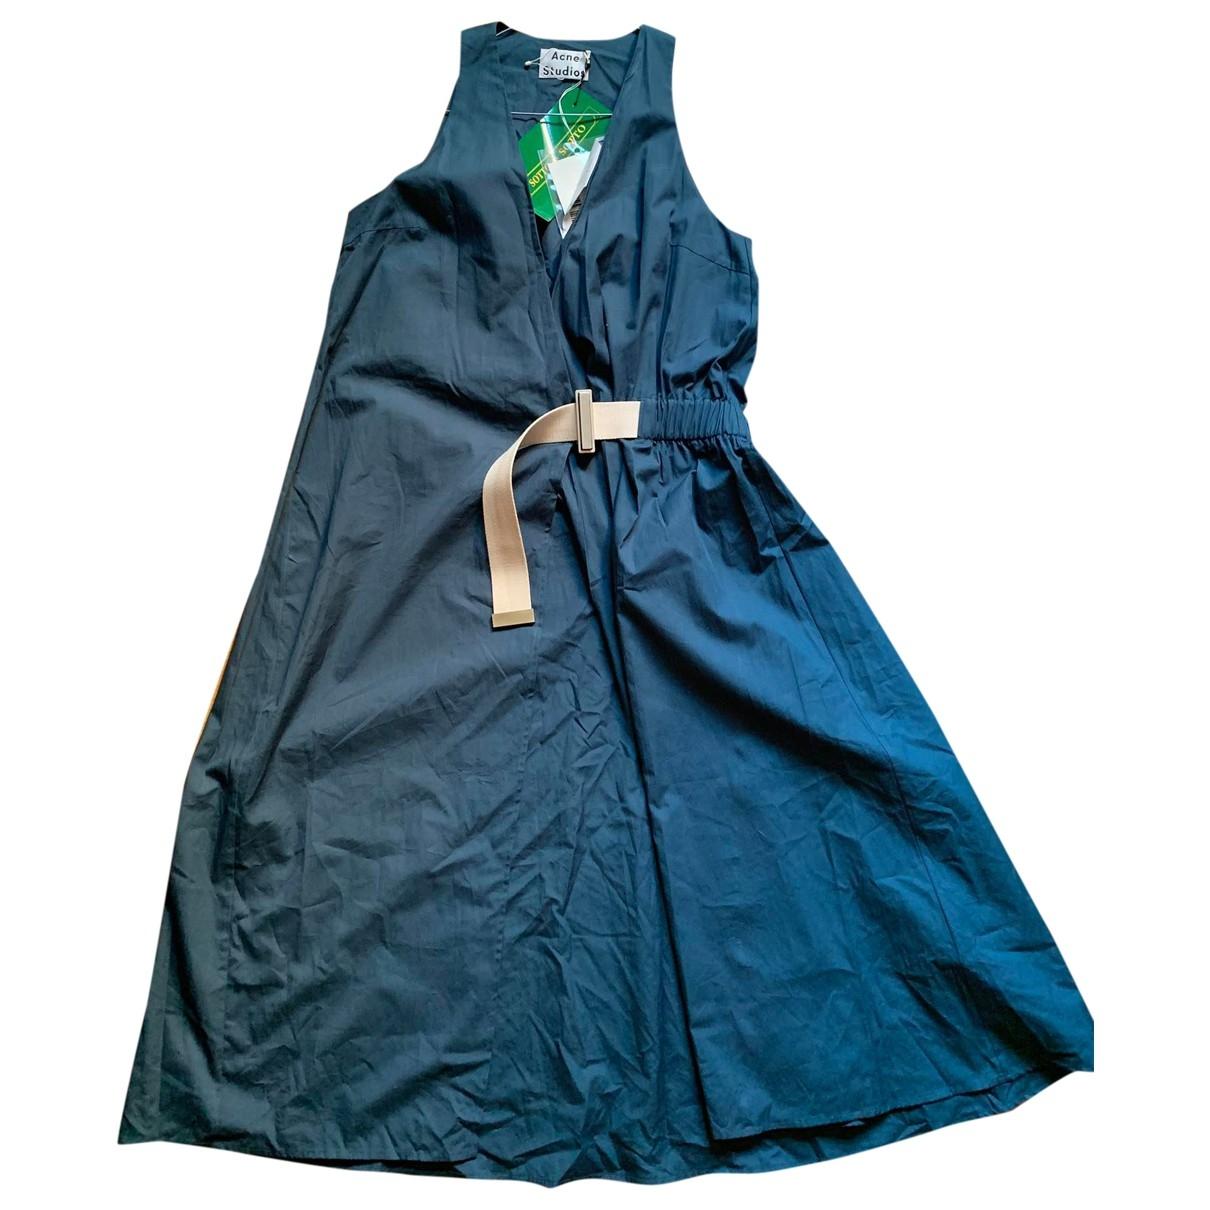 Acne Studios \N Green Cotton dress for Women 38 FR